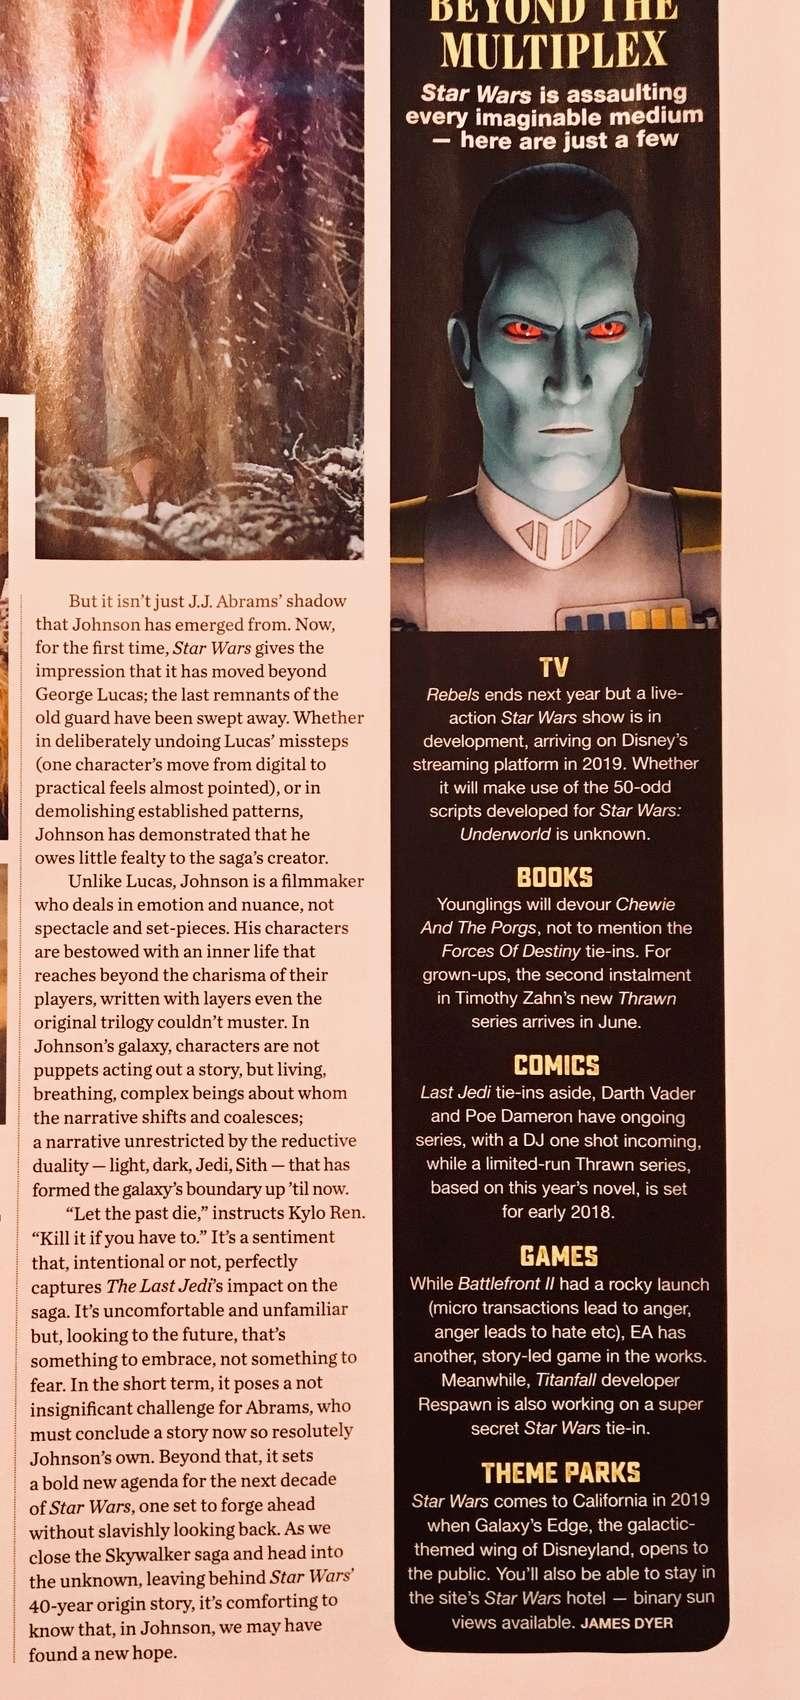 The Last Jedi: Professional Reviews, Articles  - Page 3 30d85610